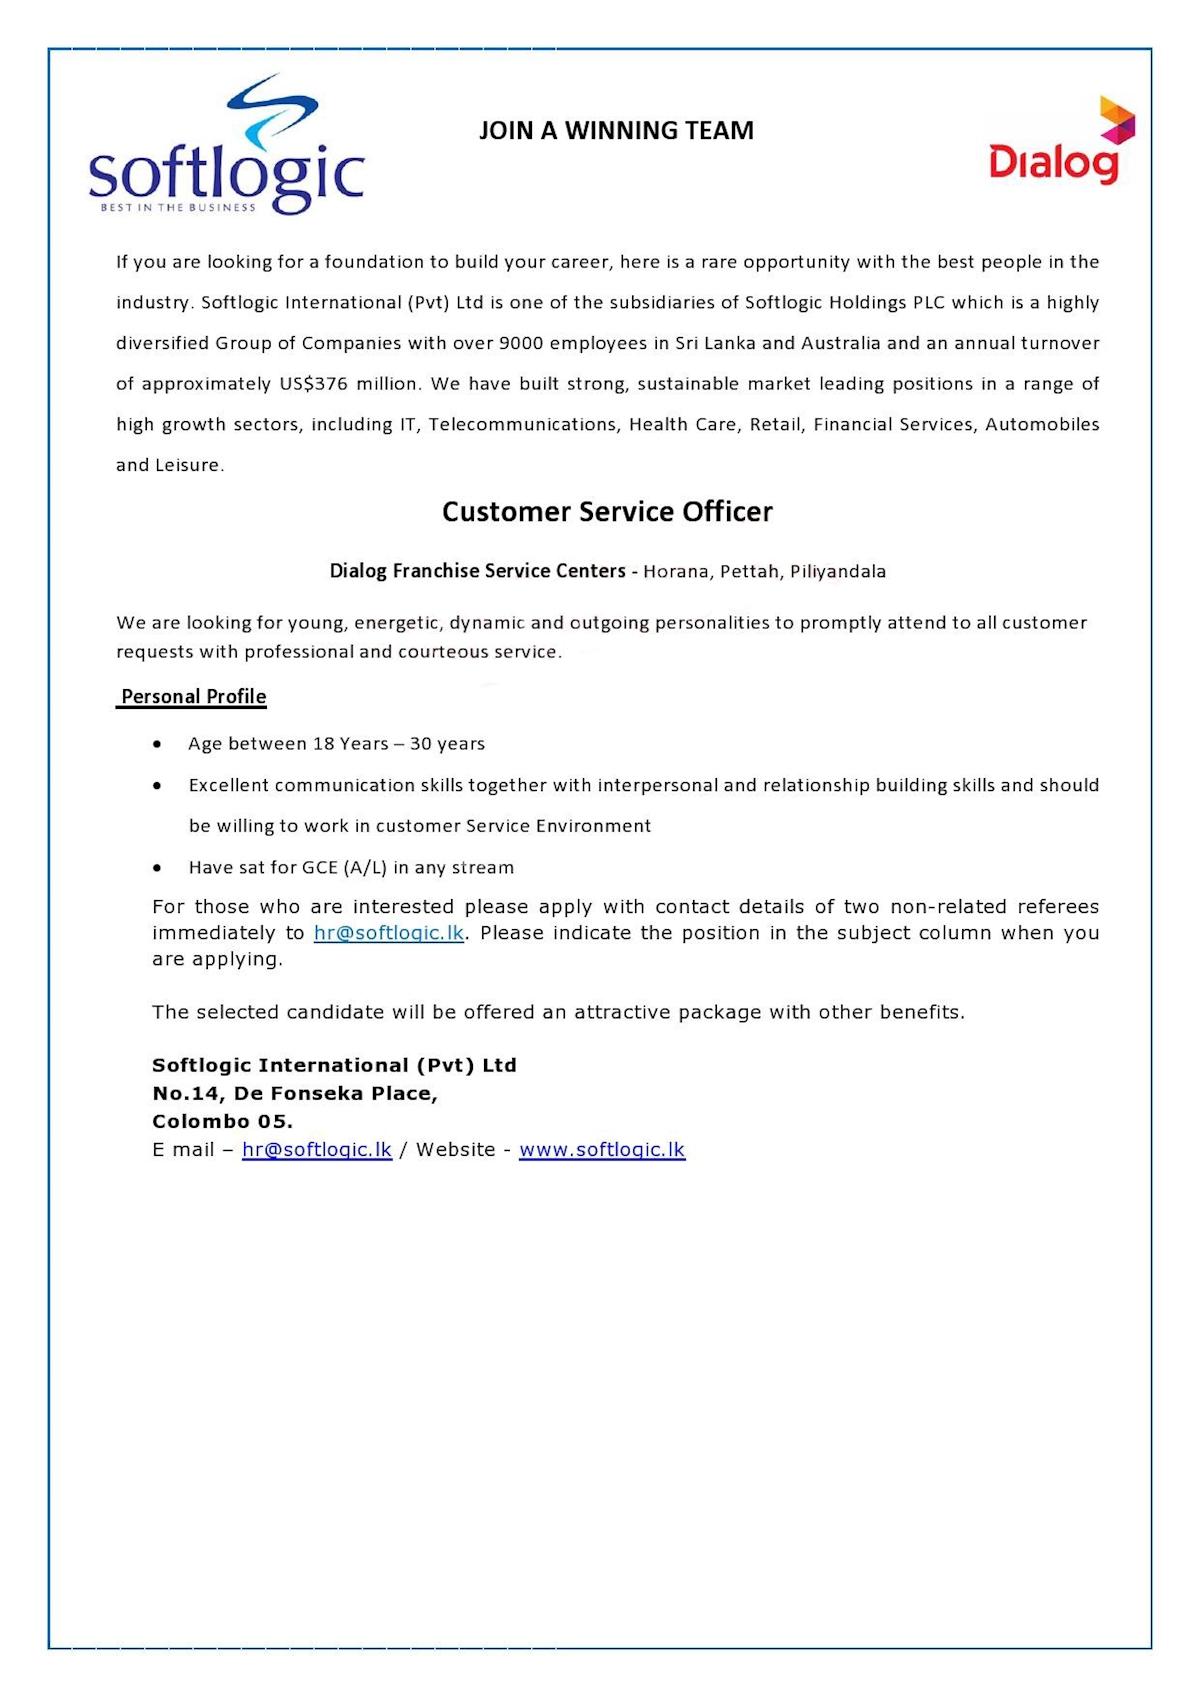 Customer Service Officer at Softlogic Holdings PLC